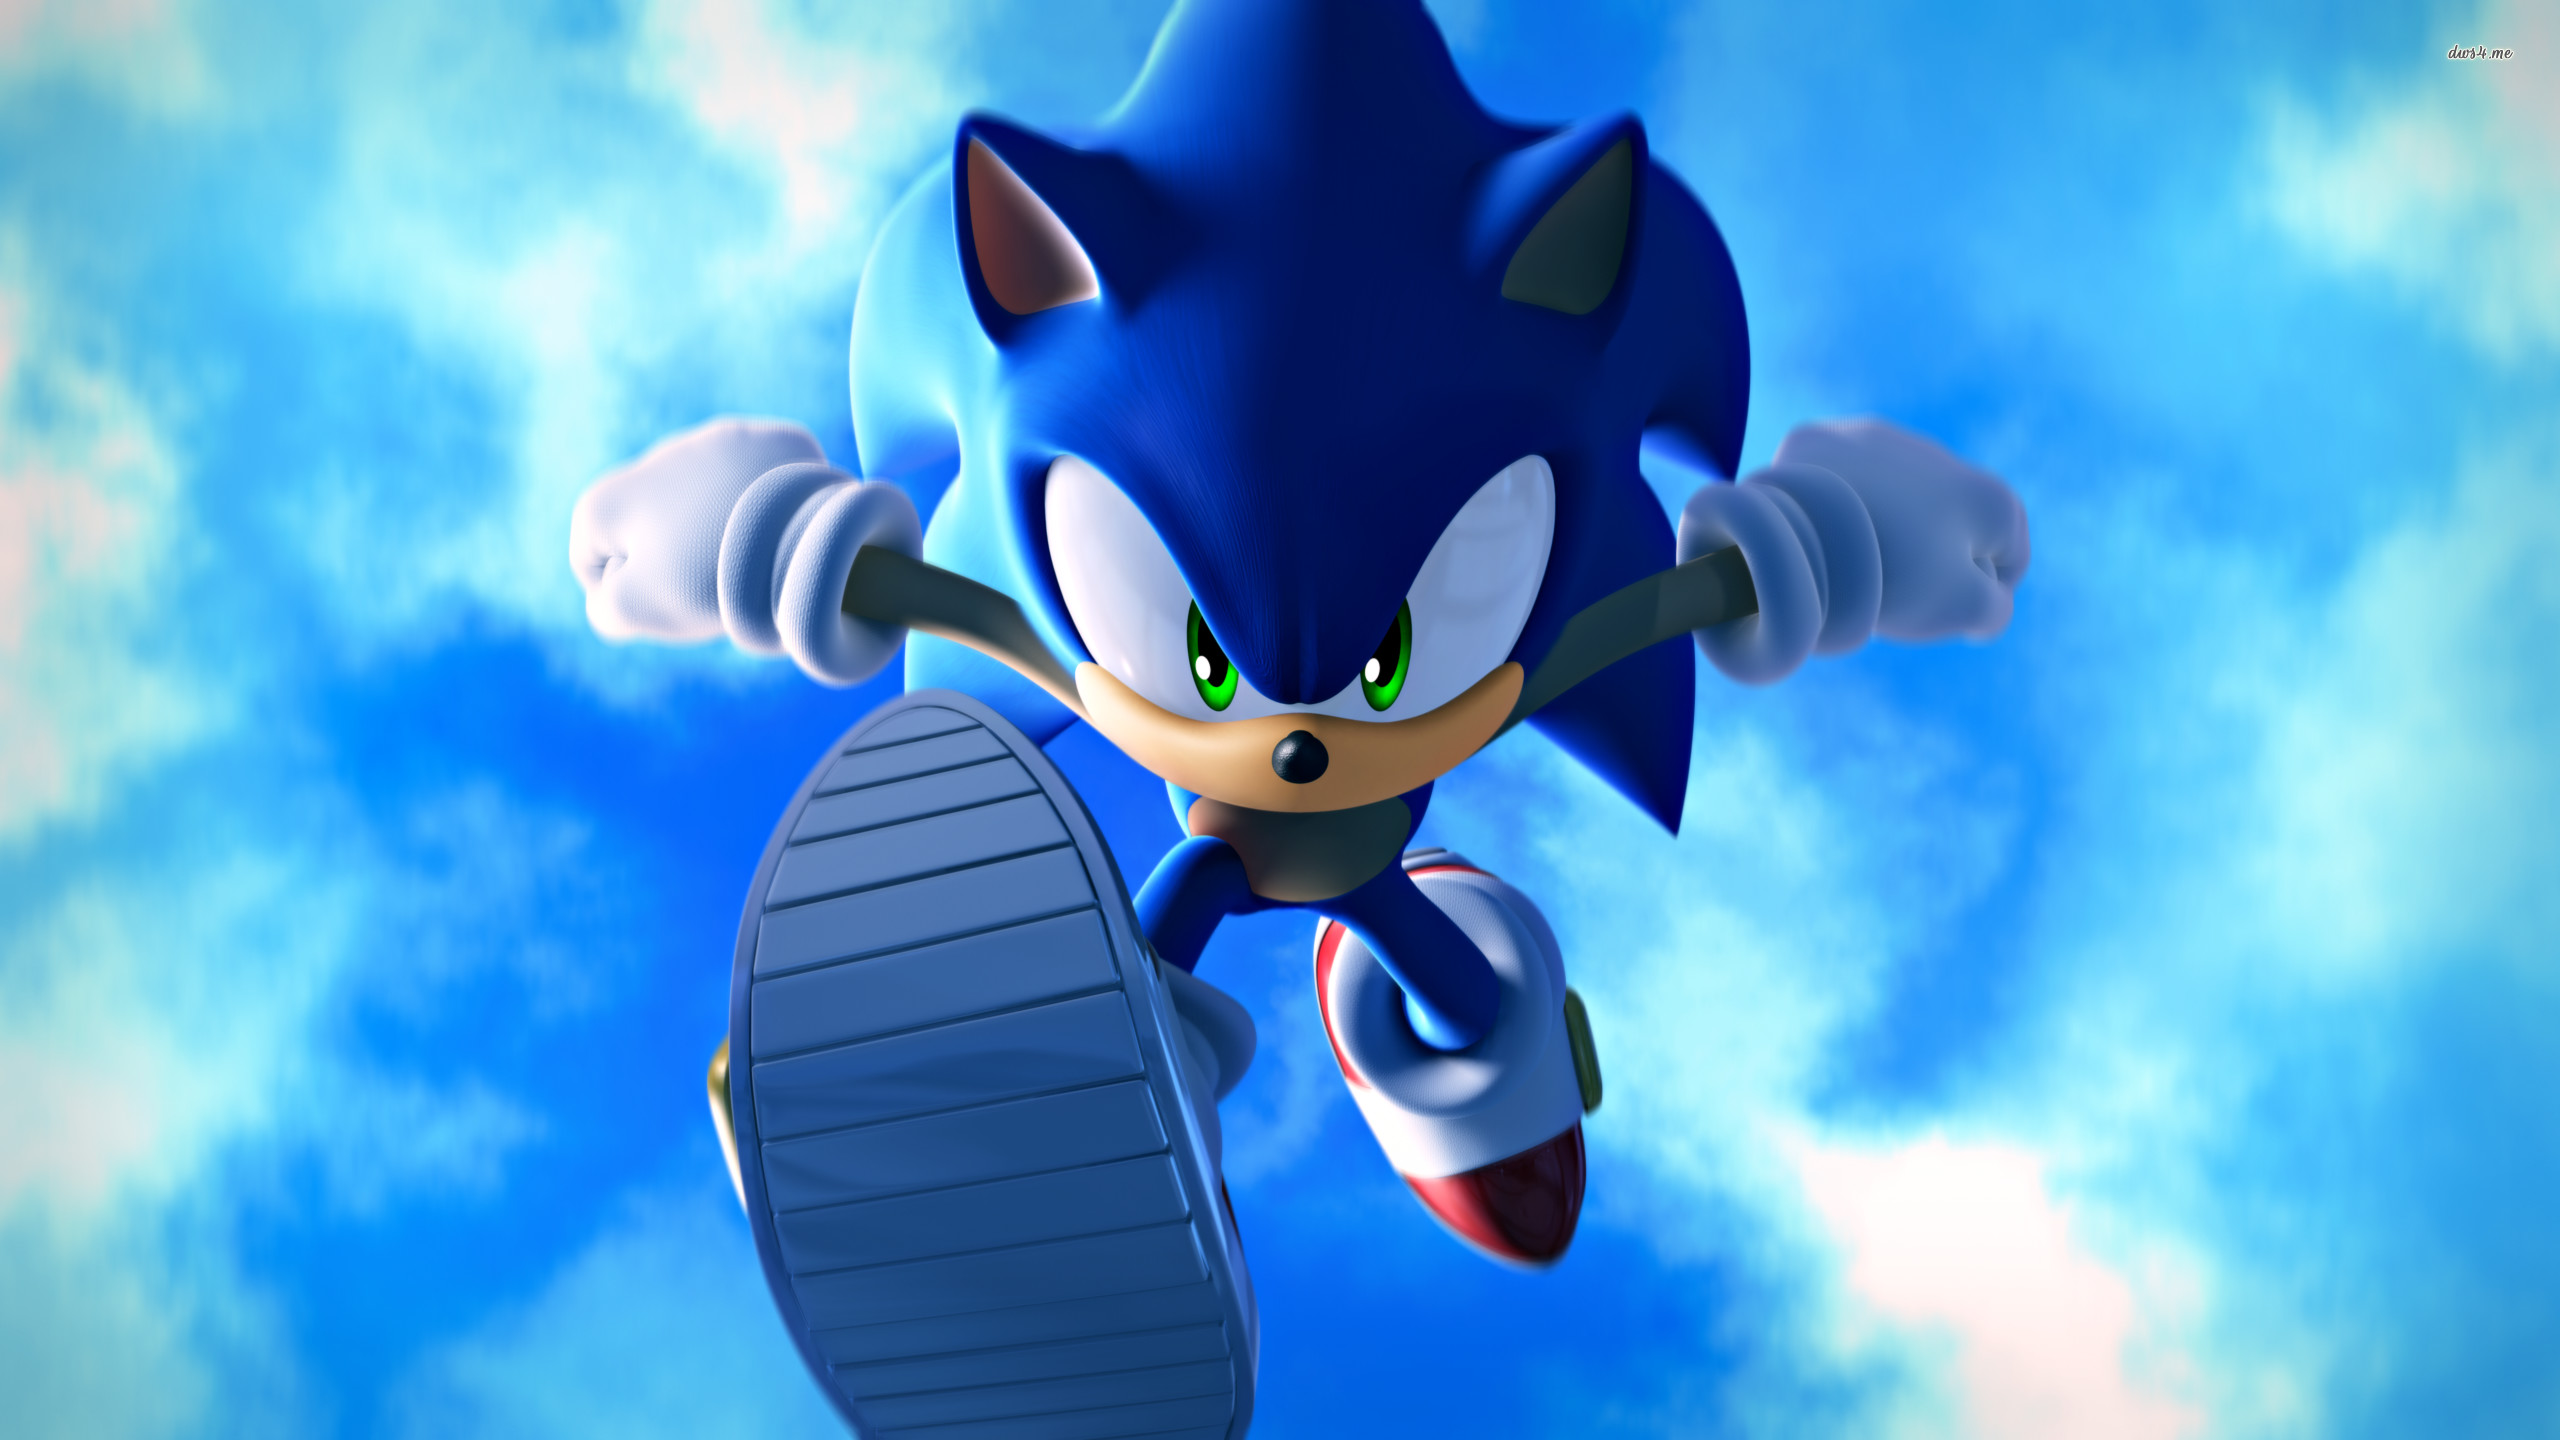 sonic the hedgehog - photo #7